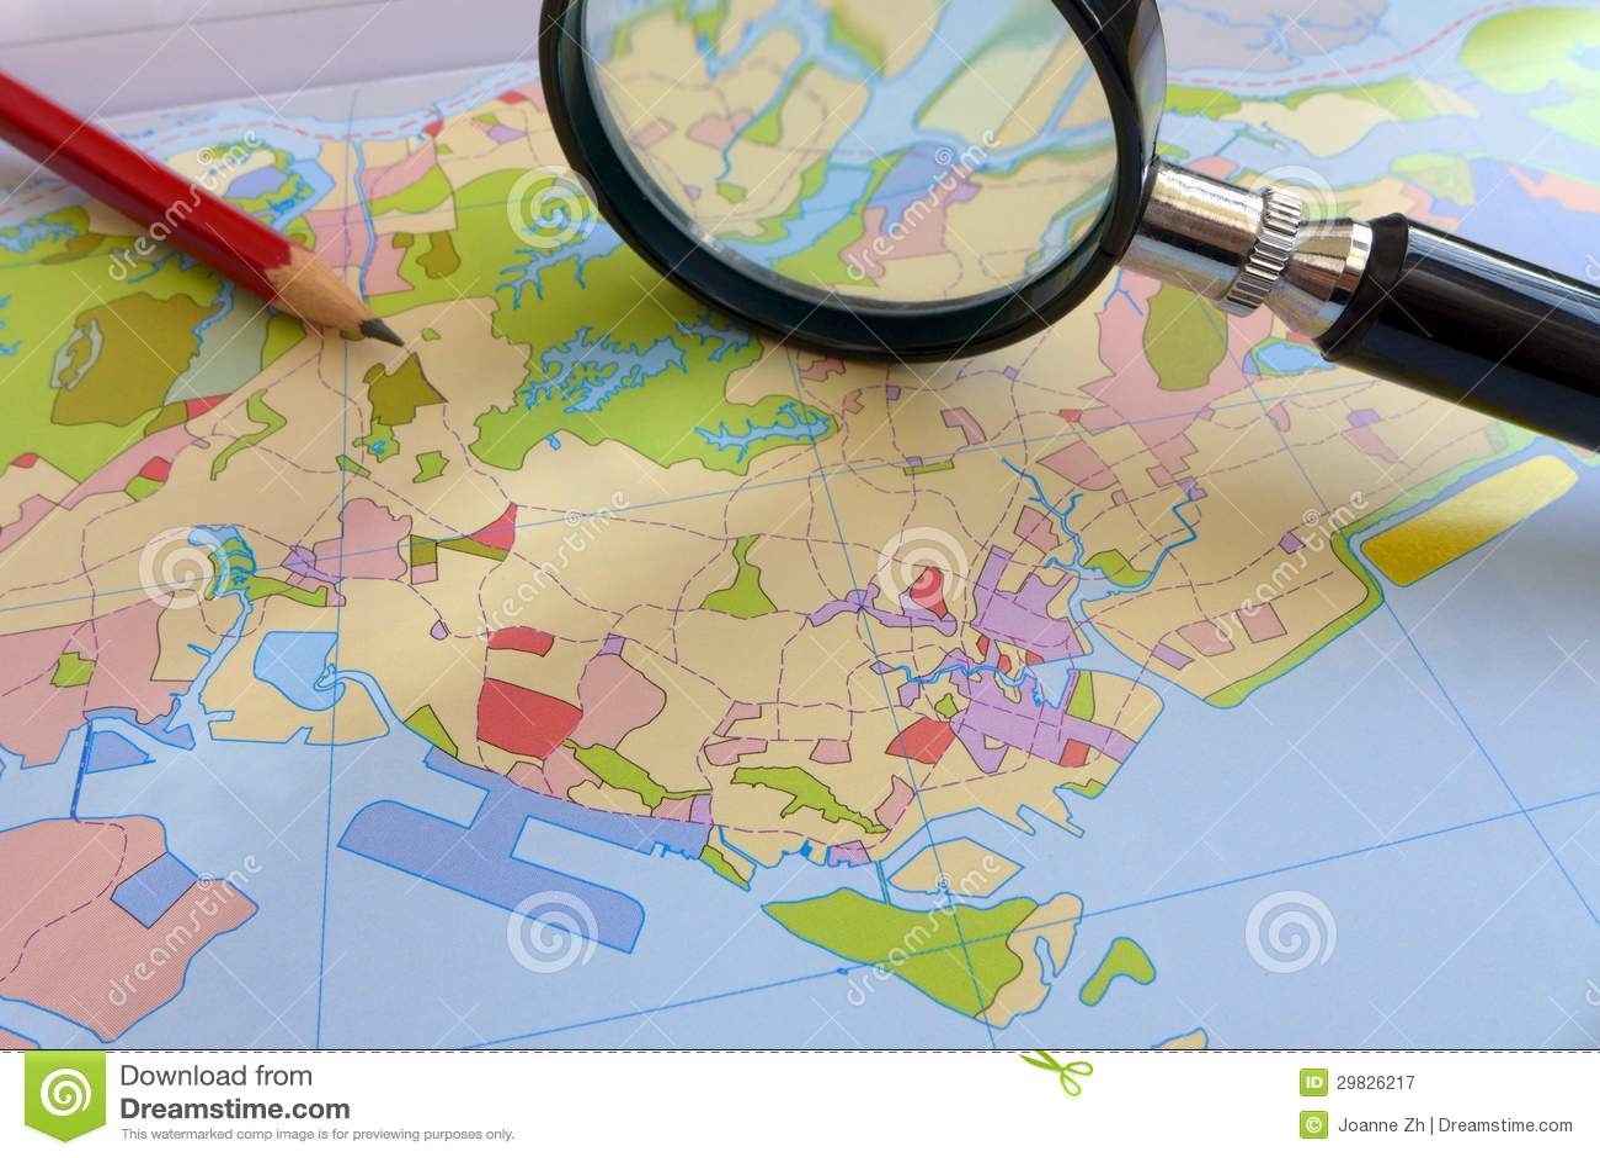 Uso de terra - conceito litoral do planeamento urbanístico